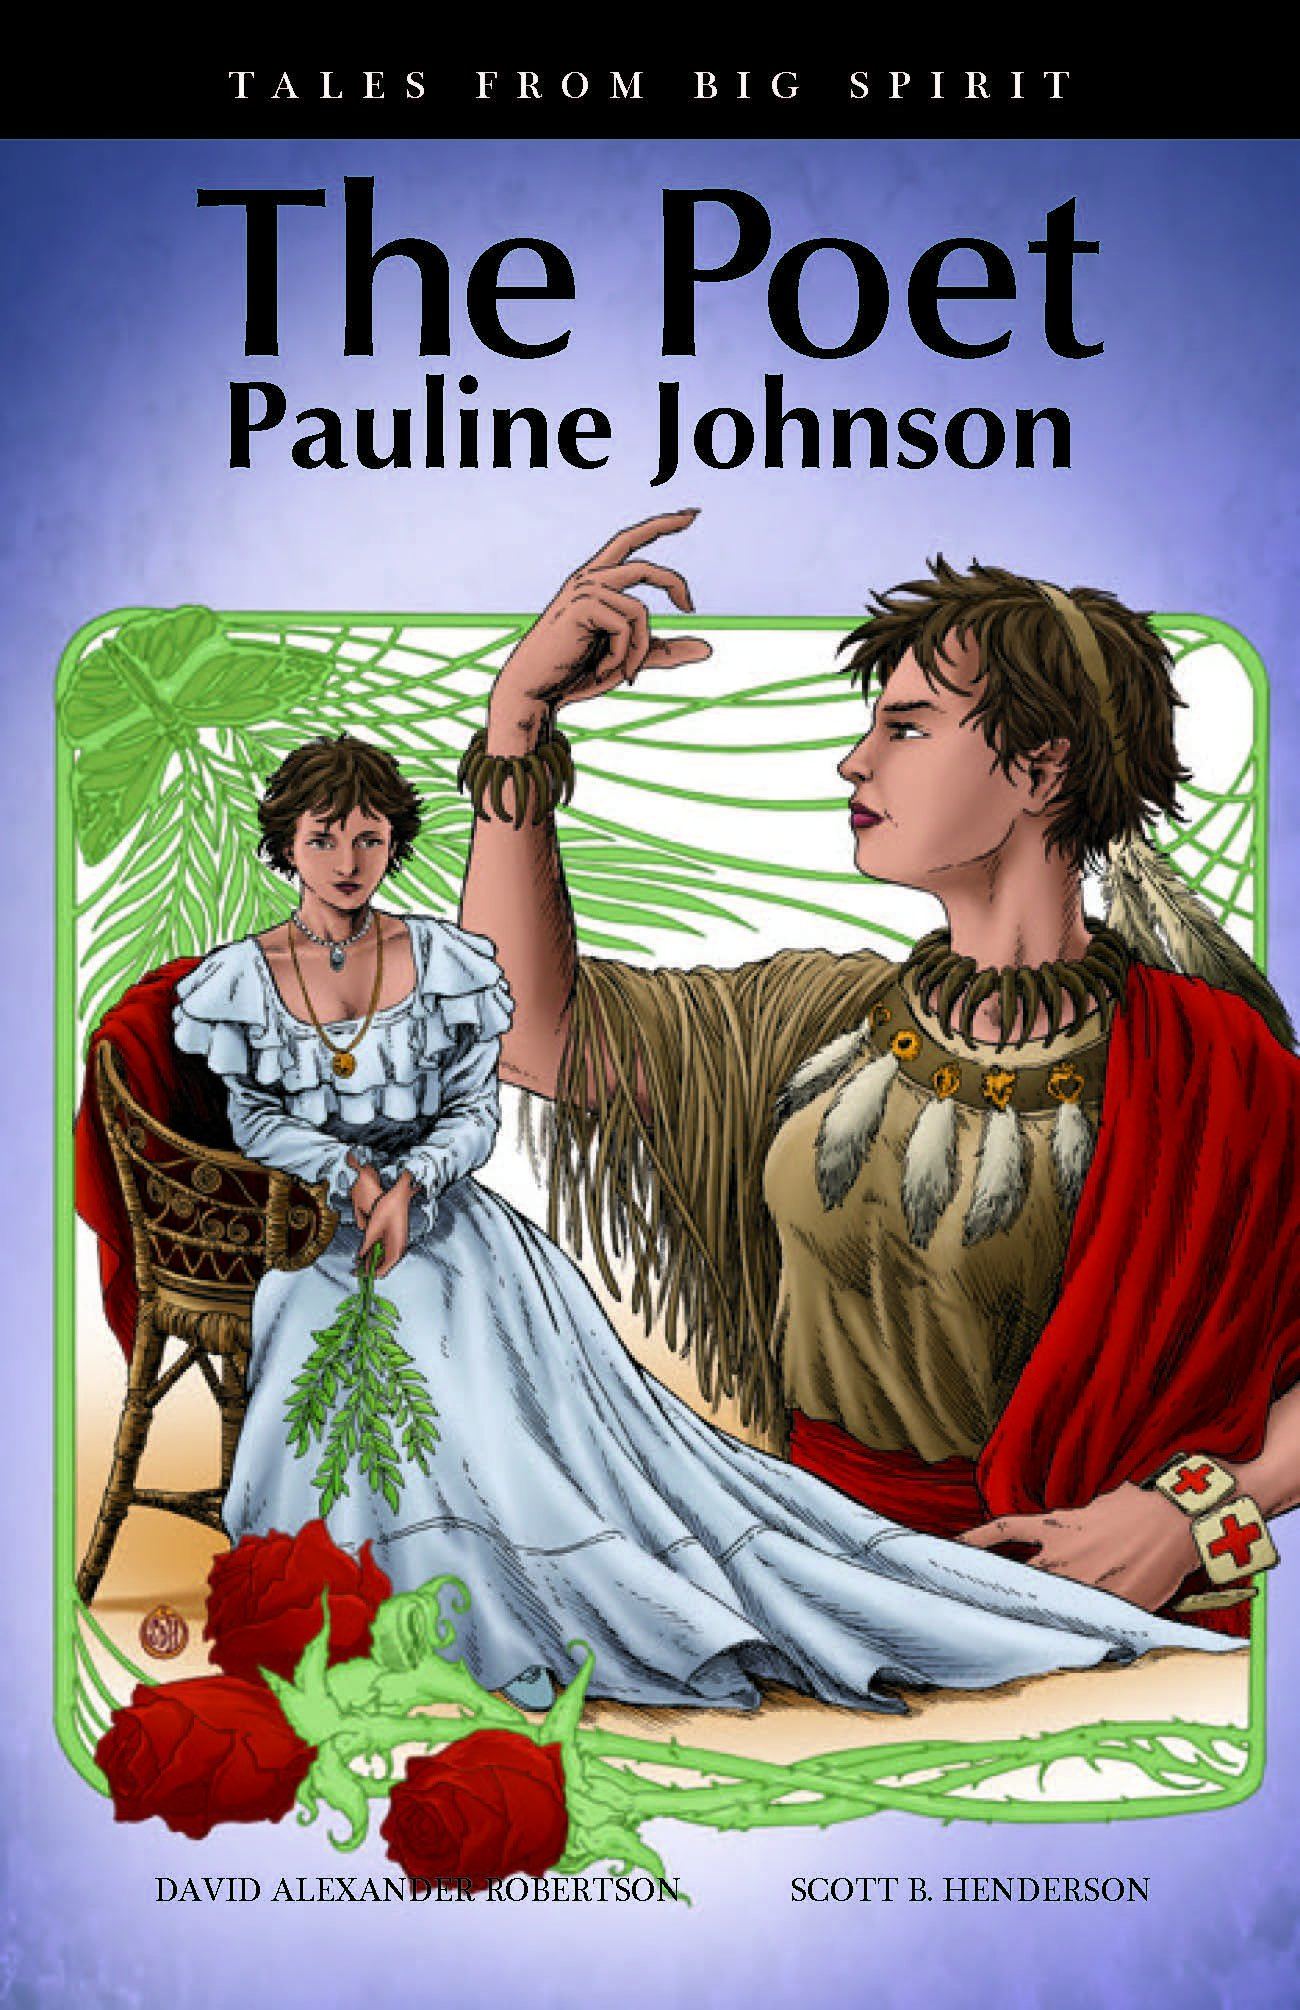 The Poet: Pauline Johnson (Tales from Big Spirit)